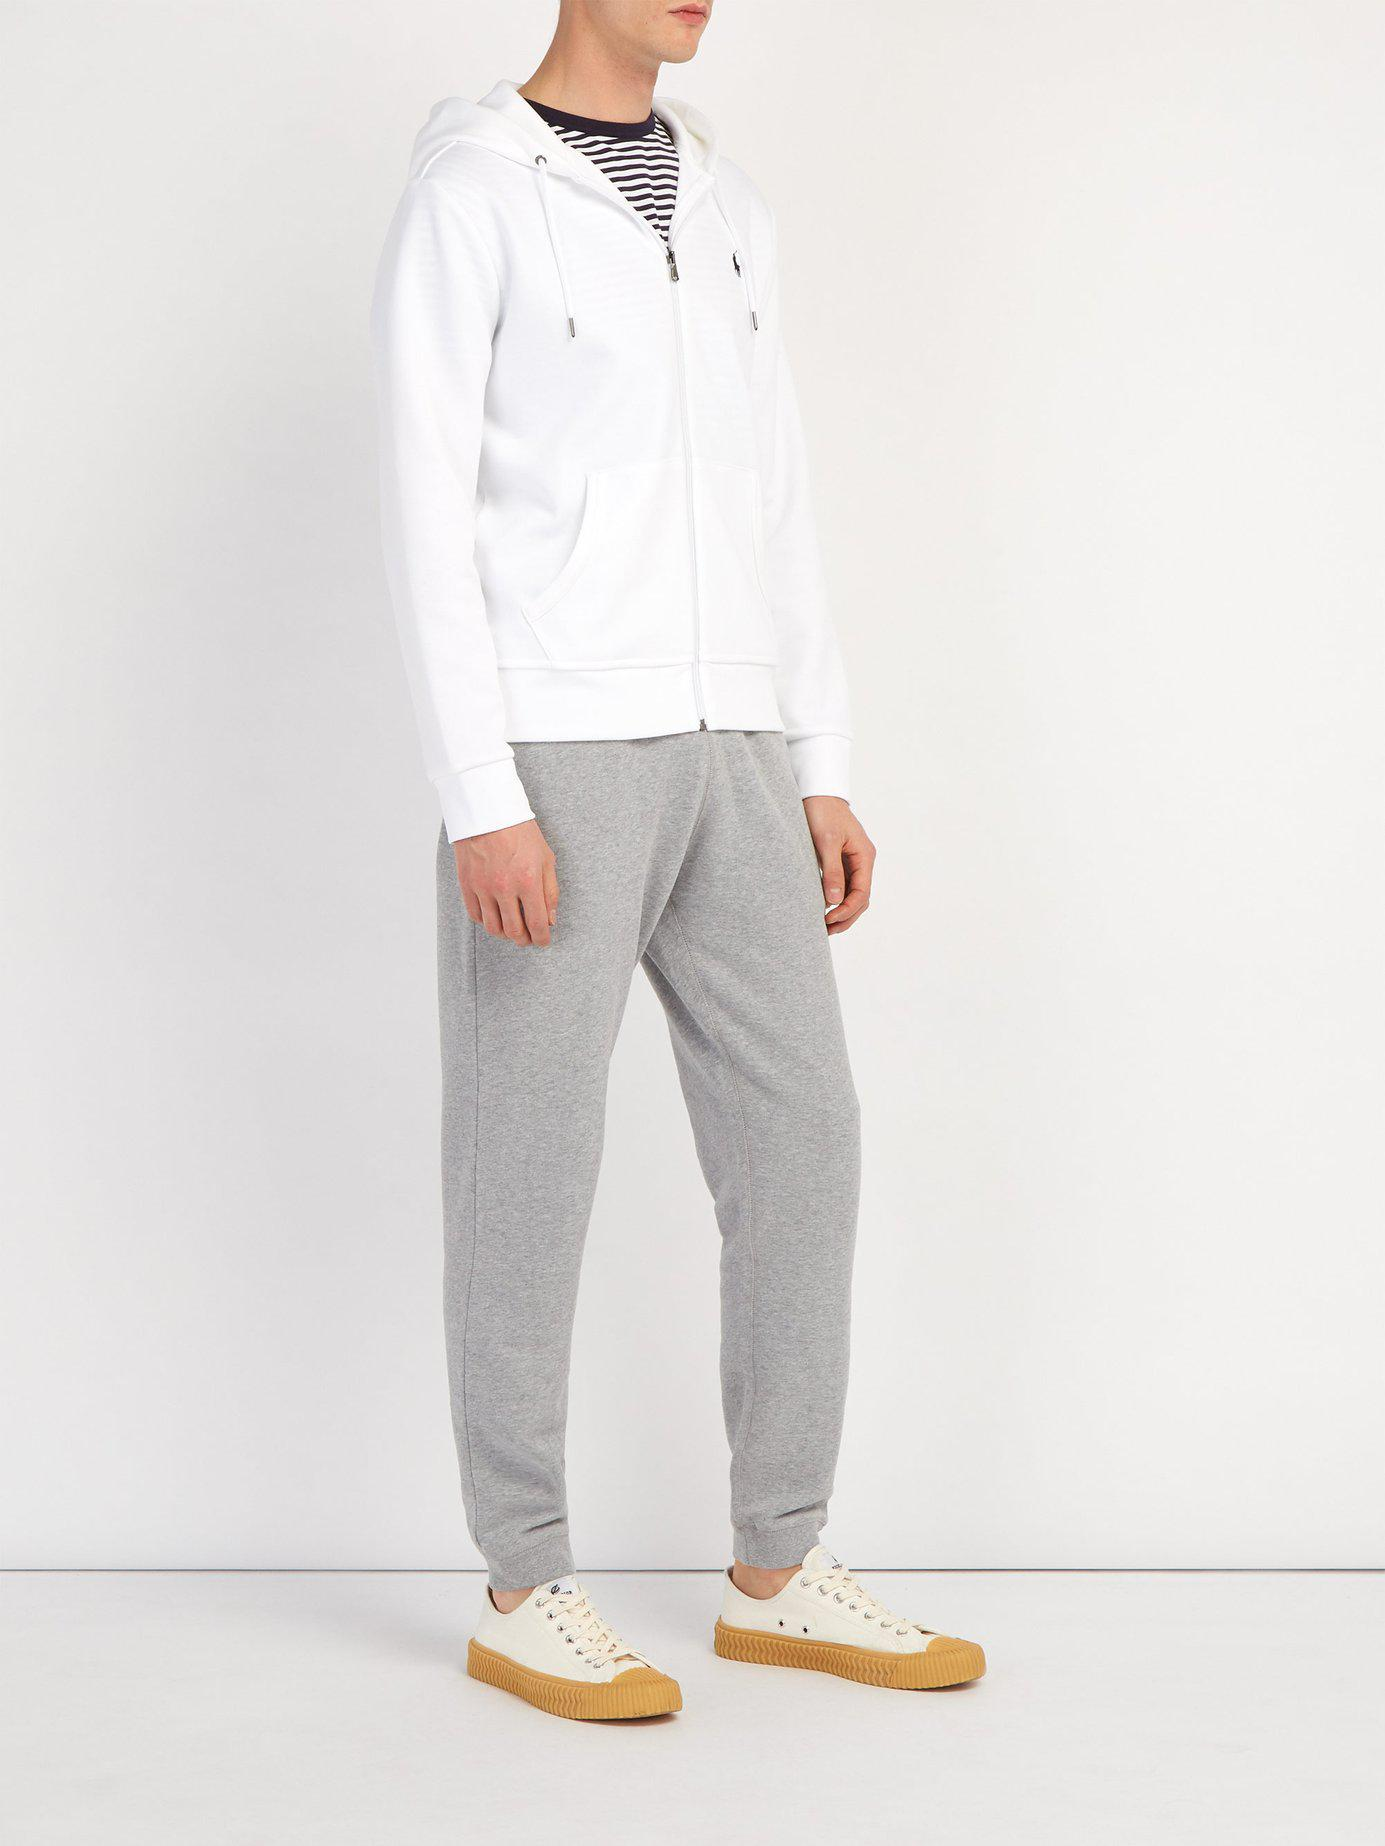 19bfb65e Lyst - Polo Ralph Lauren Logo Embroidered Zip Through Hooded Sweatshirt in  White for Men